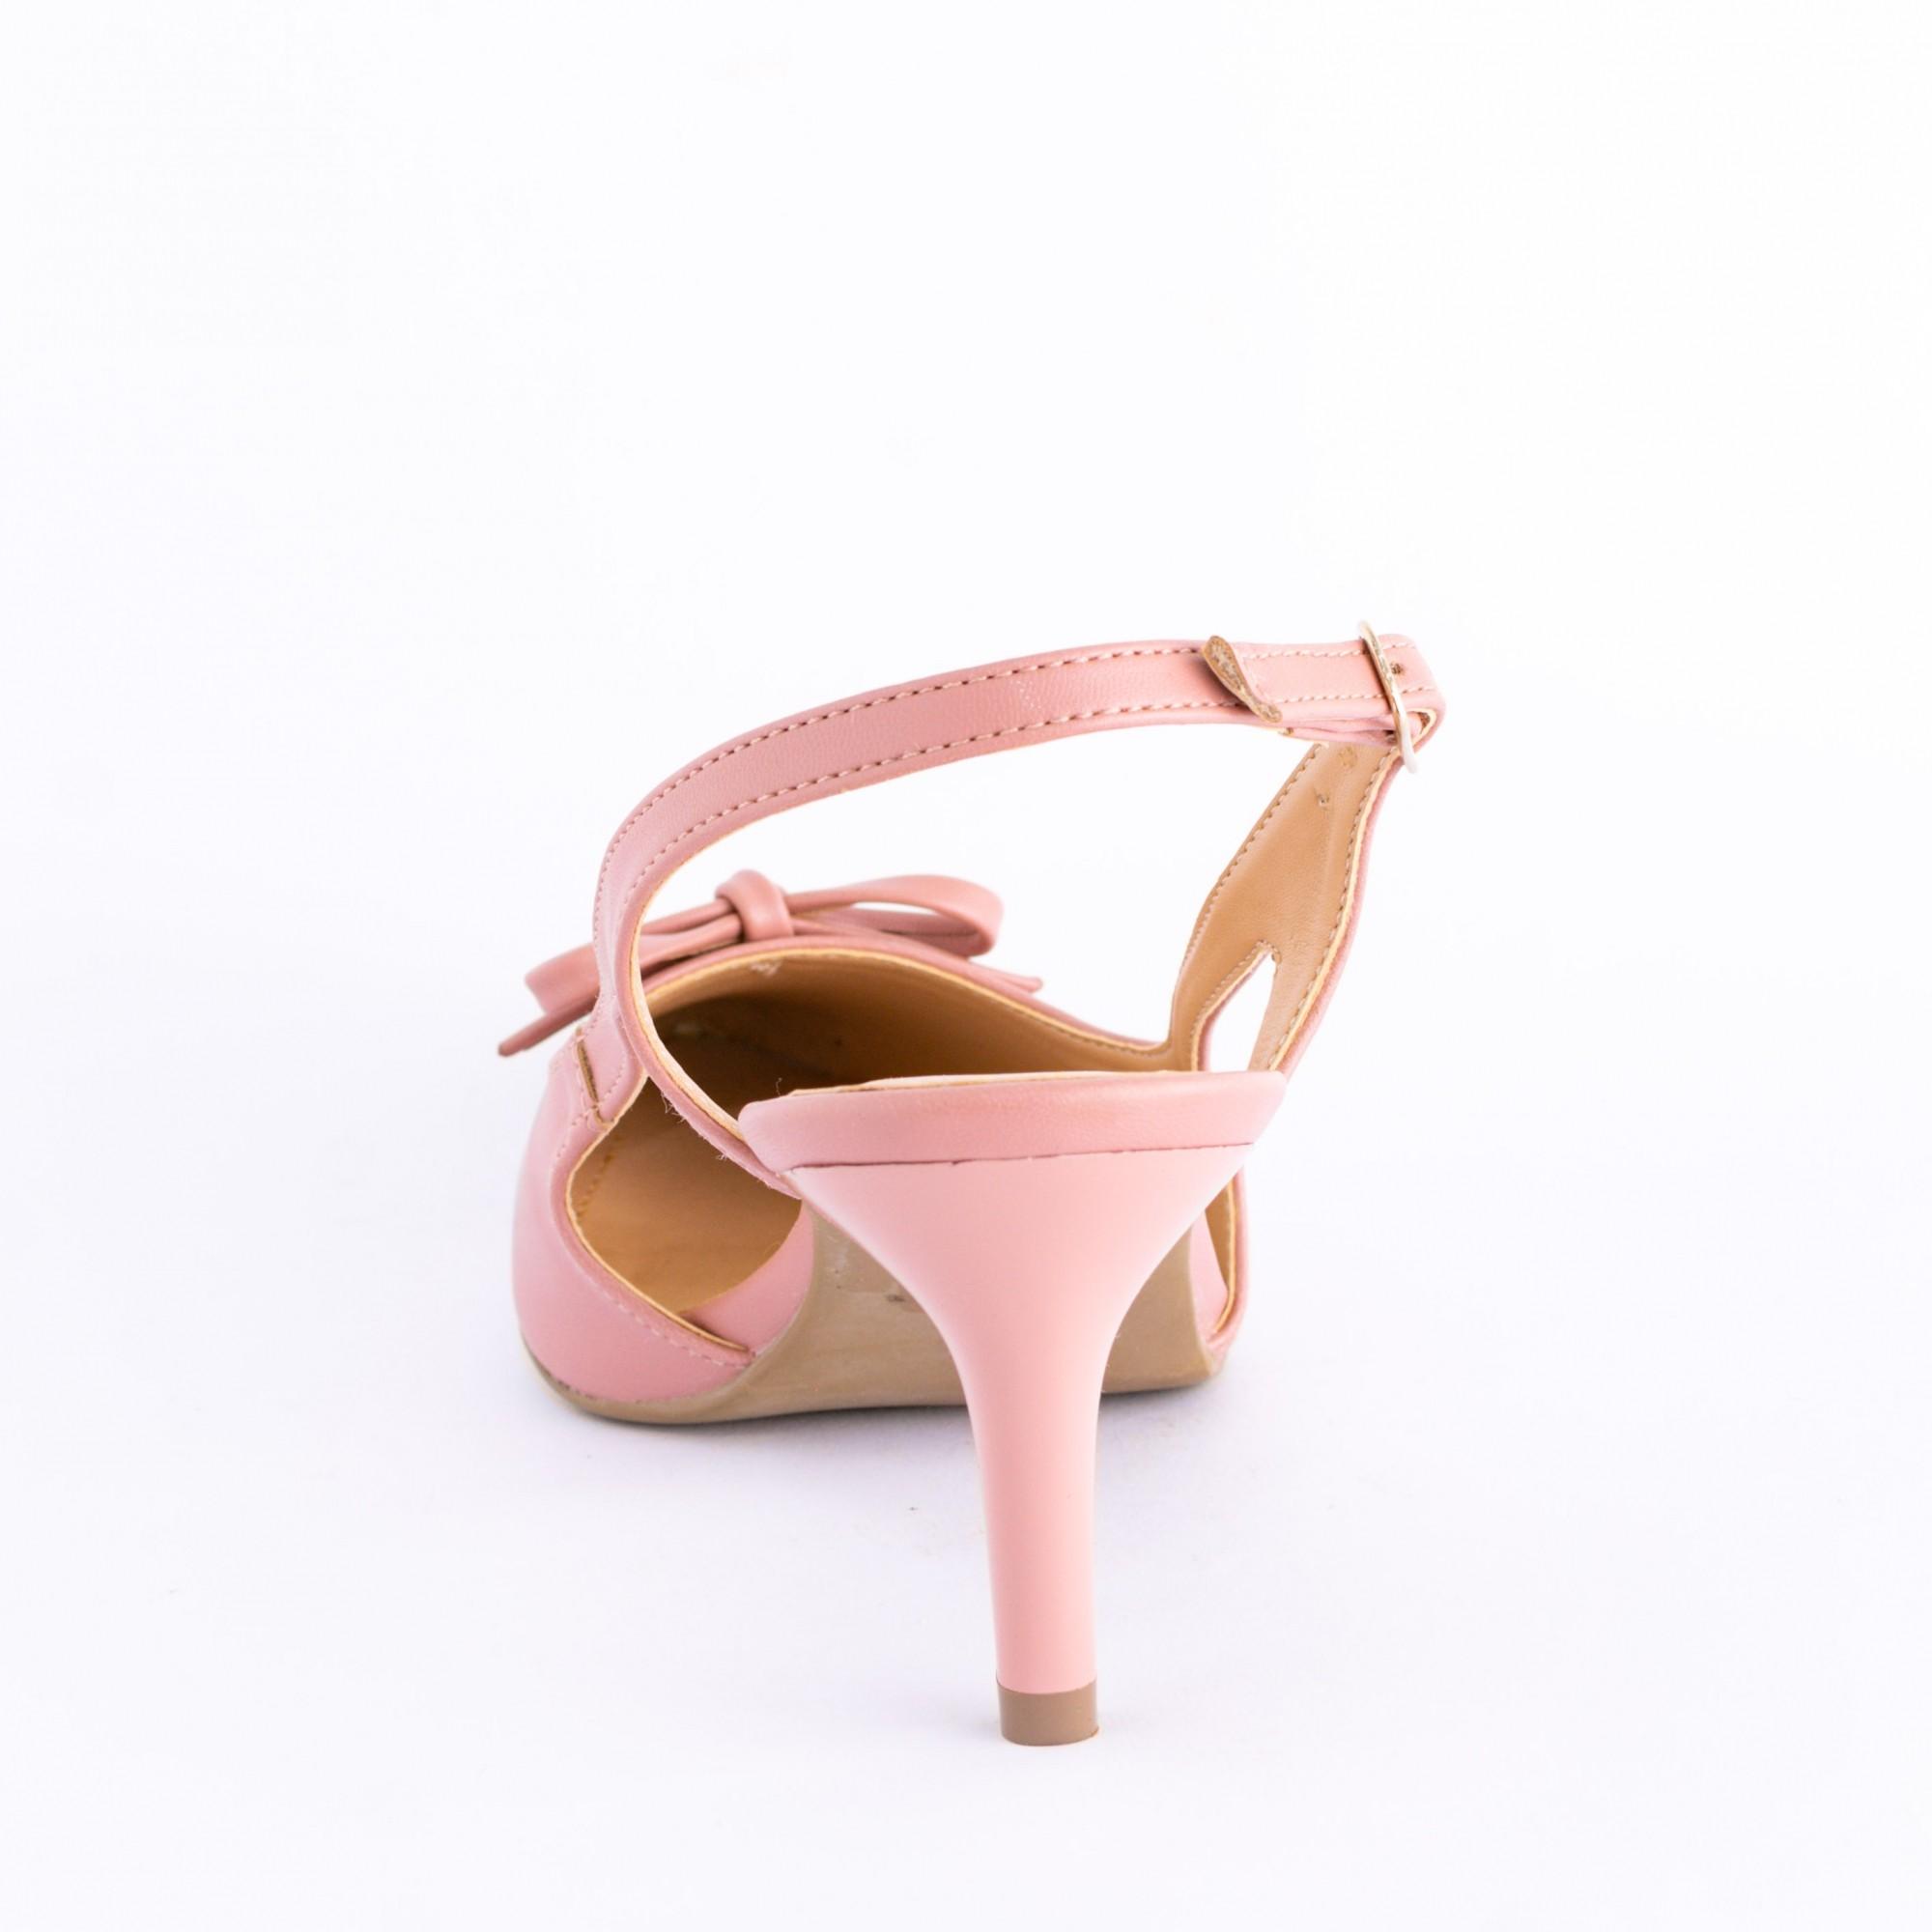 Scarpin Chanel Rosa Salto Fino Médio